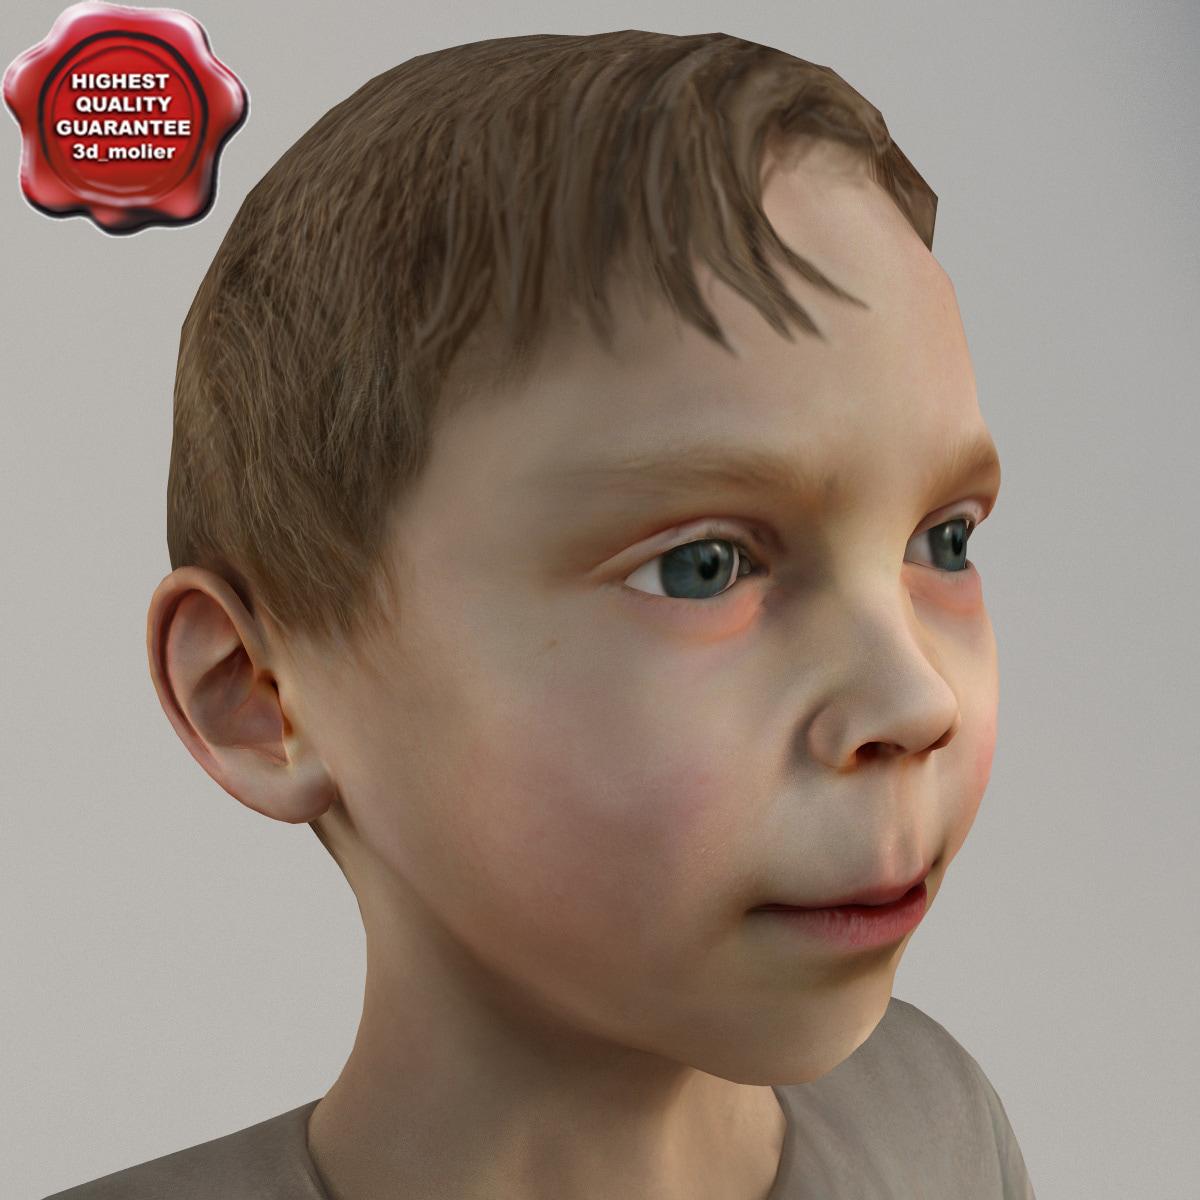 Boy_10-13_Years_T-Pose_00.jpg